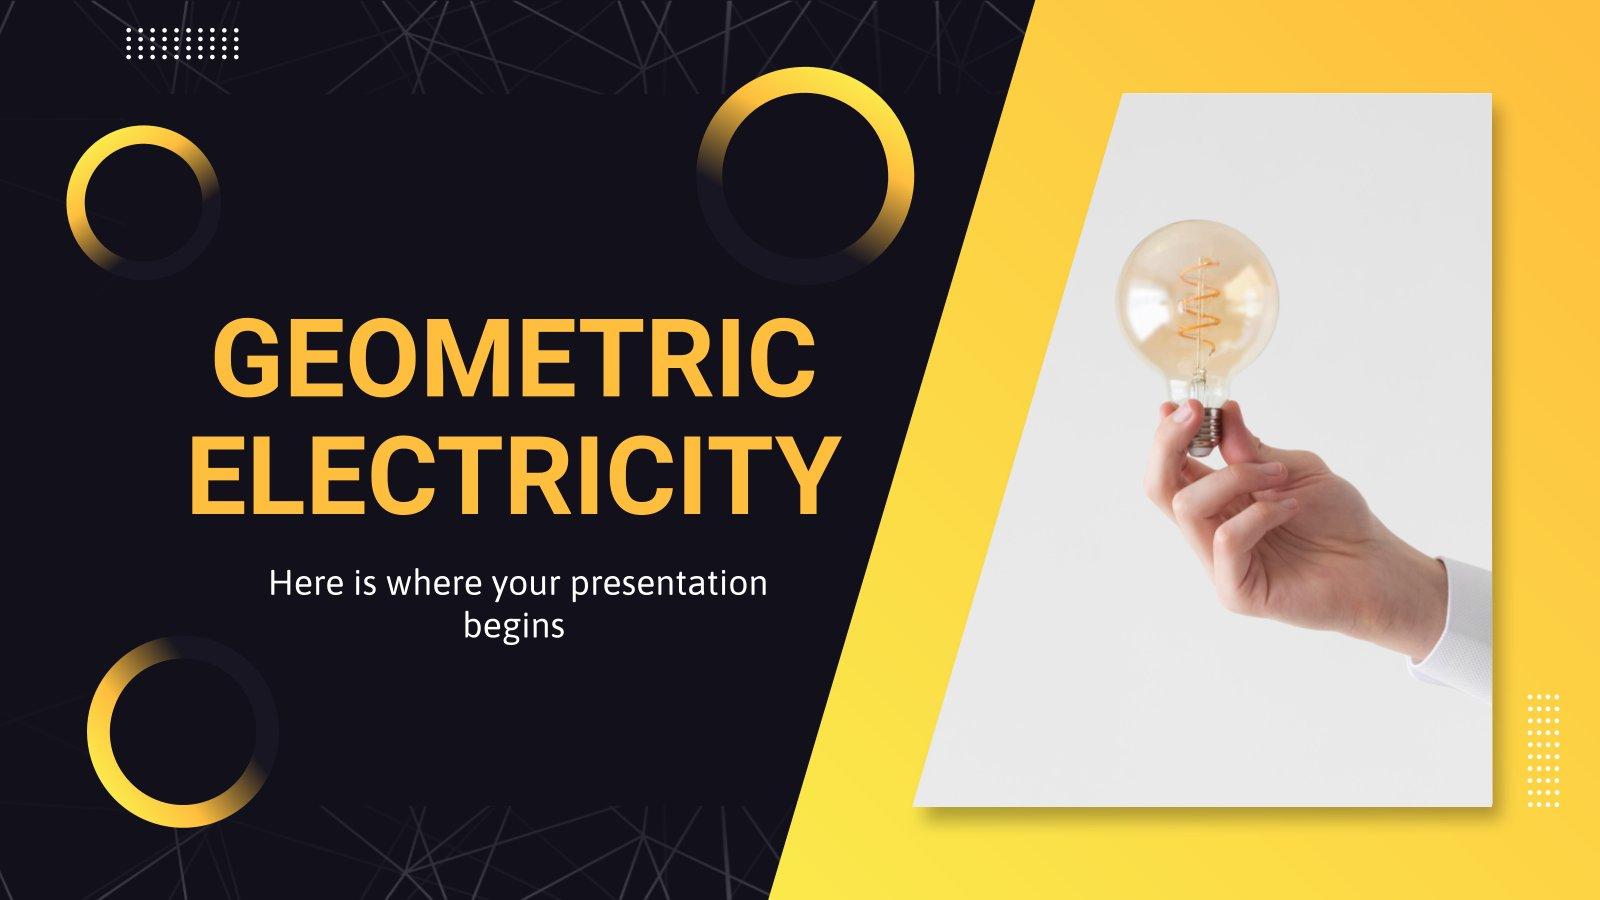 Geometric Electricity presentation template